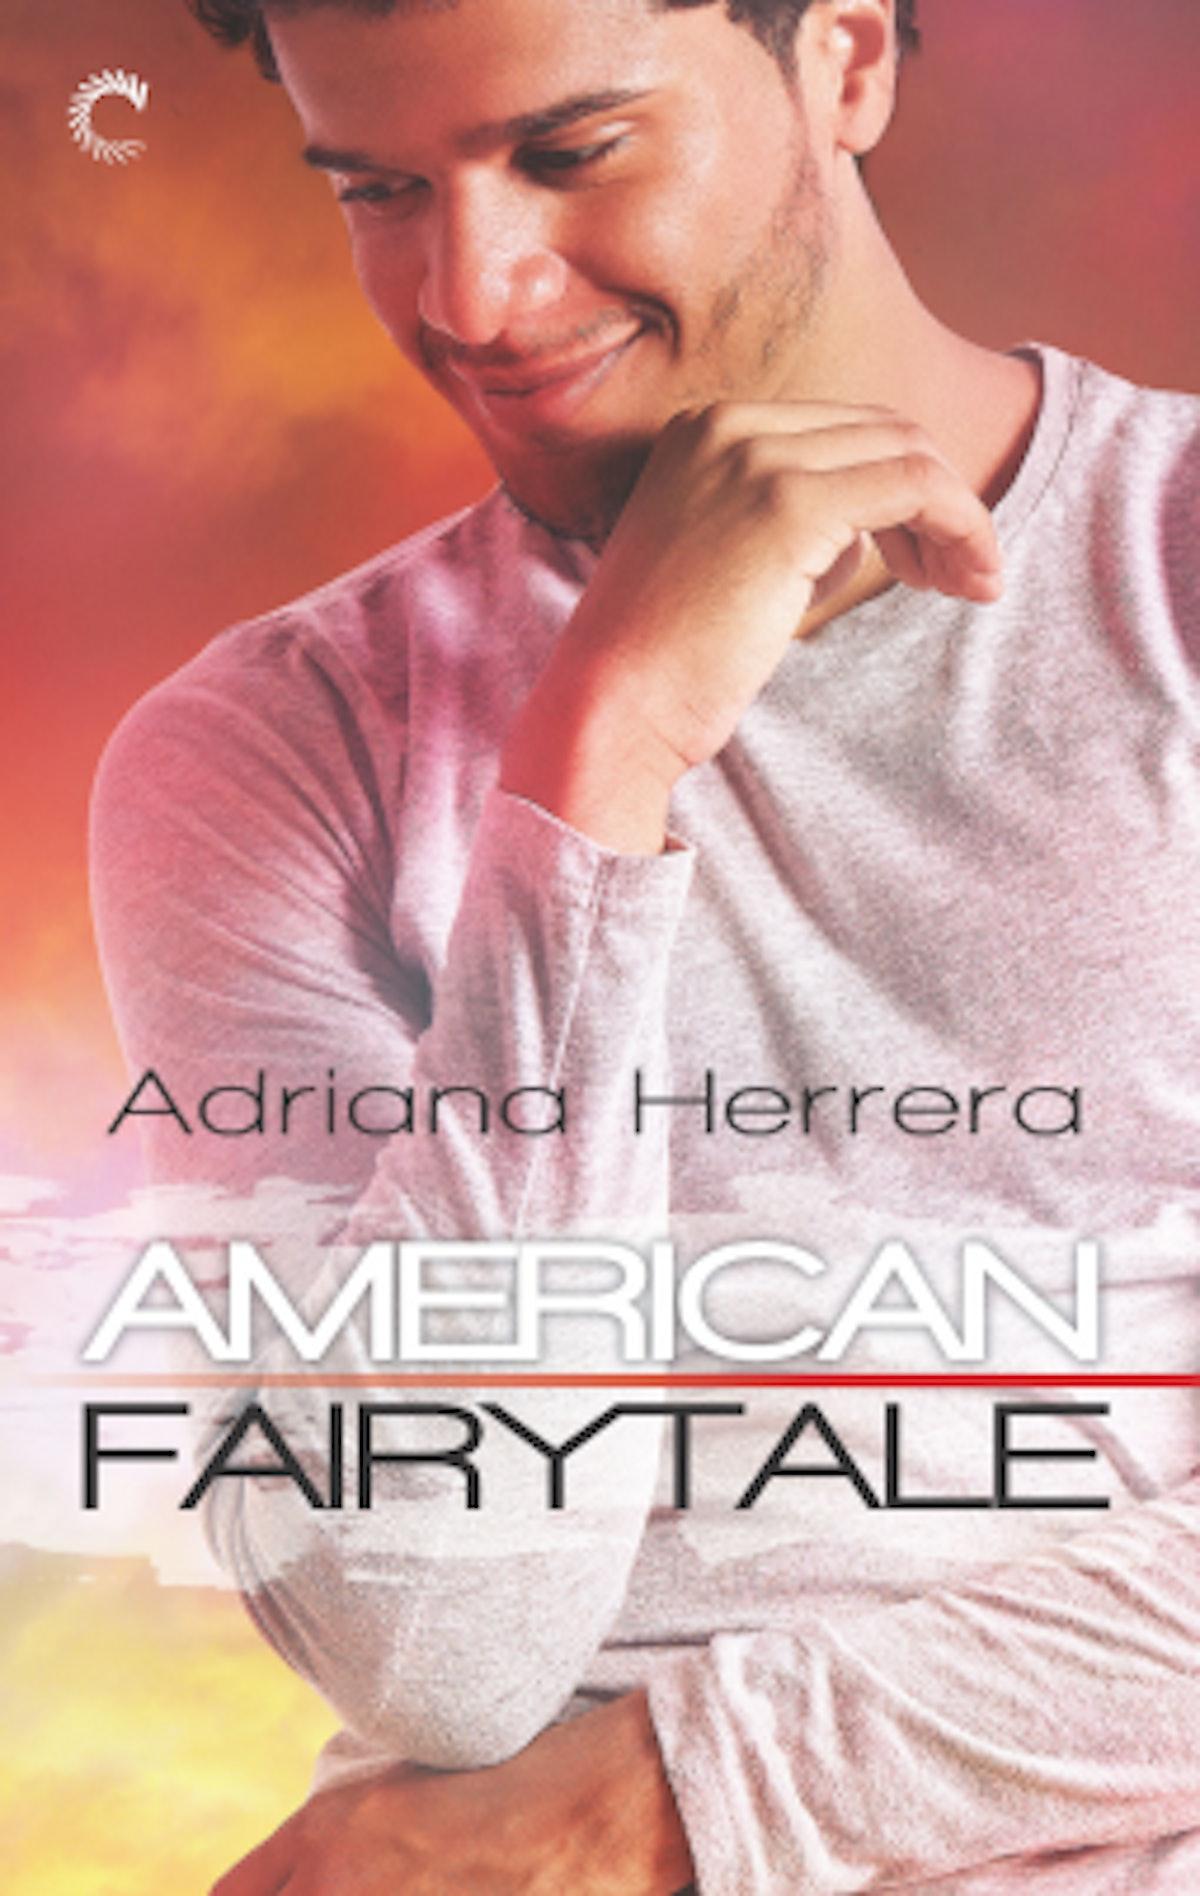 'American Fairytale' by Adriana Herrera